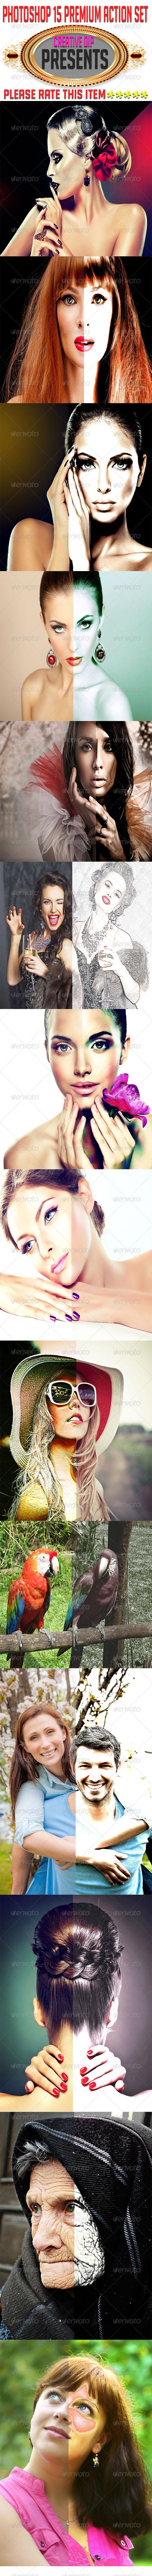 GraphicRiver Photoshop 15 Premium Action Set 7773605